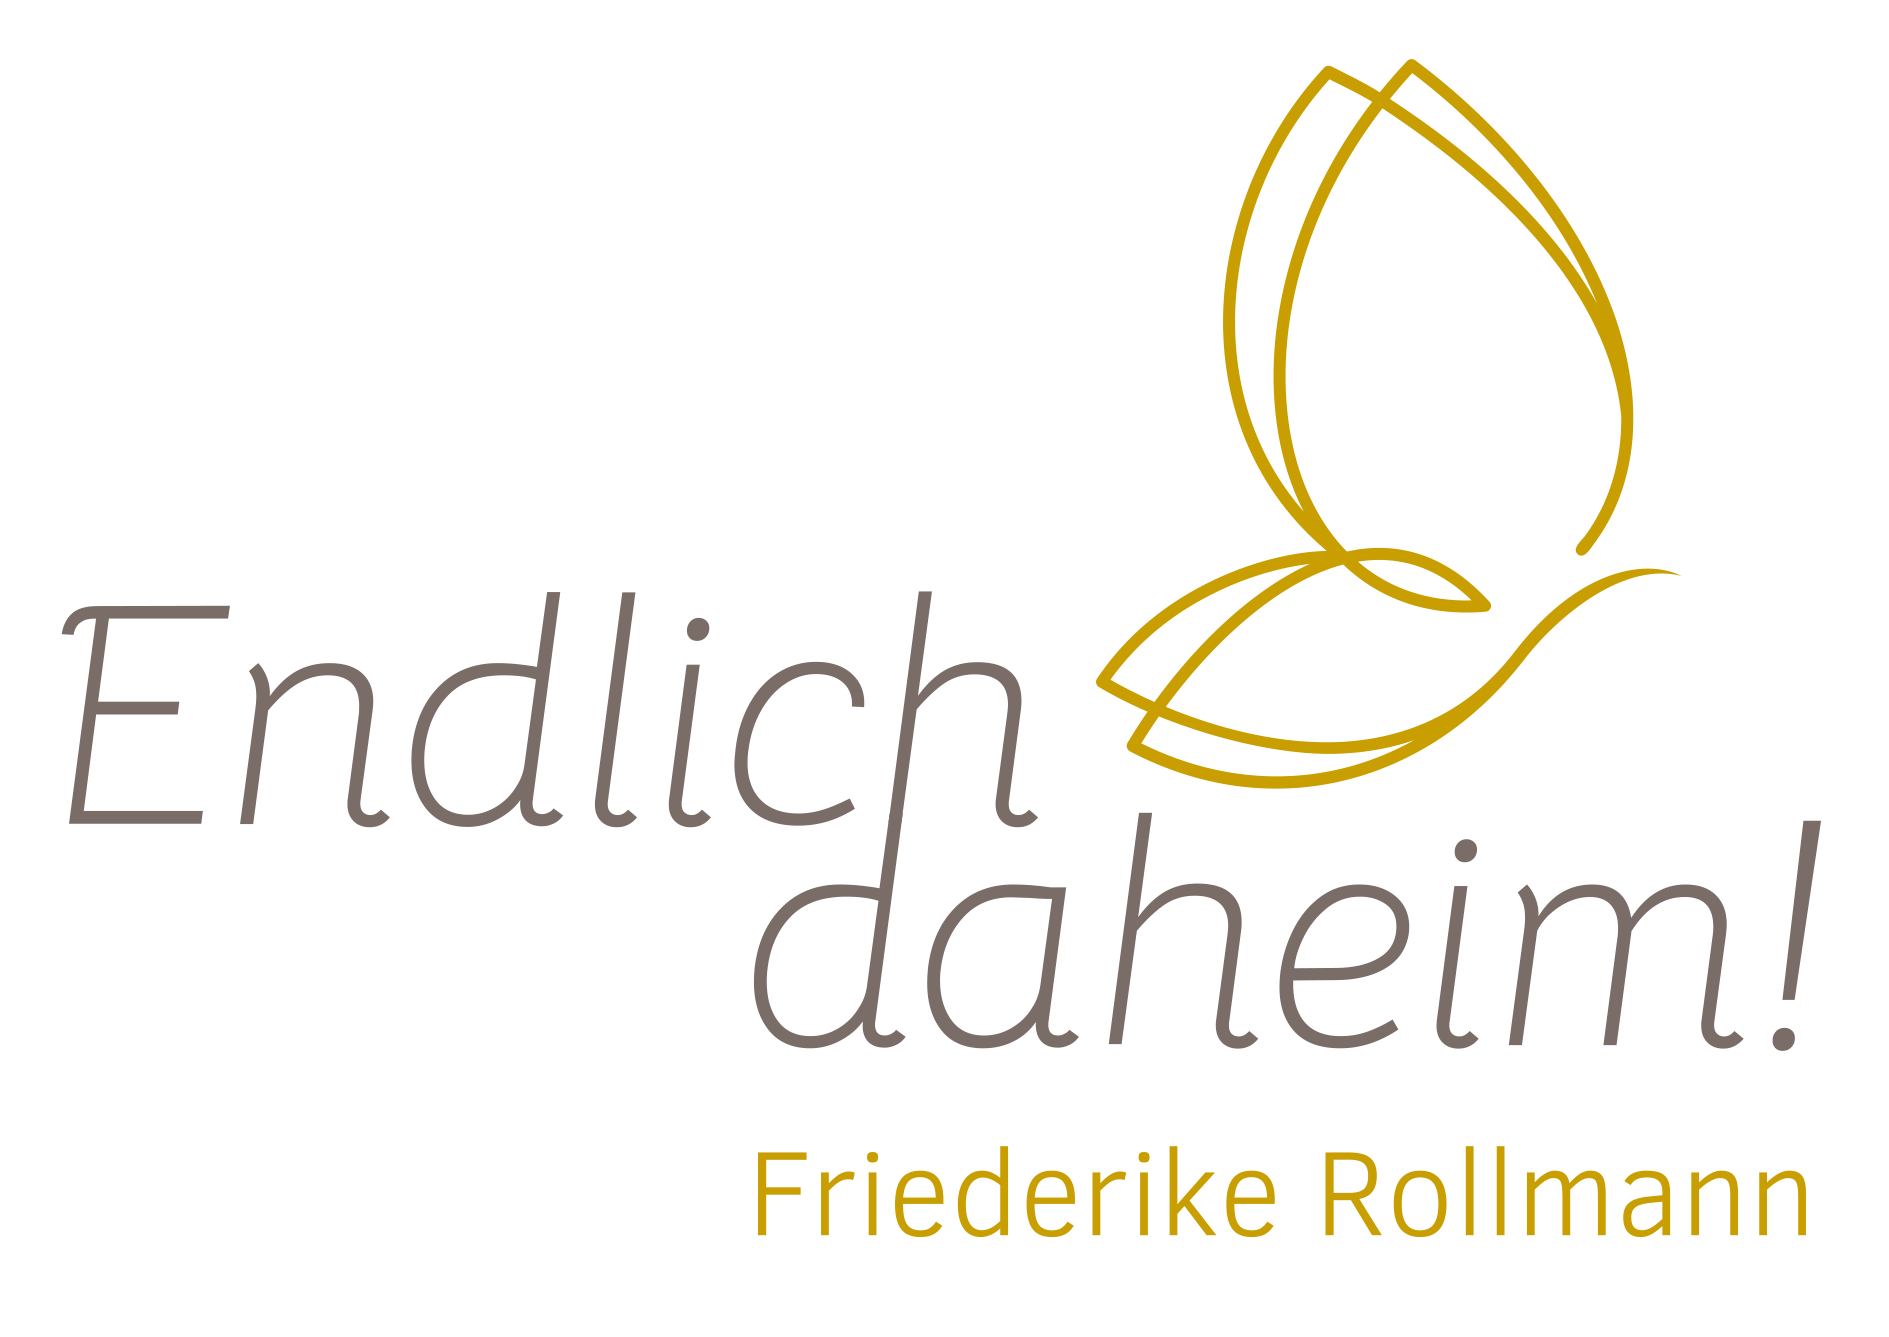 Friederike Rollmann